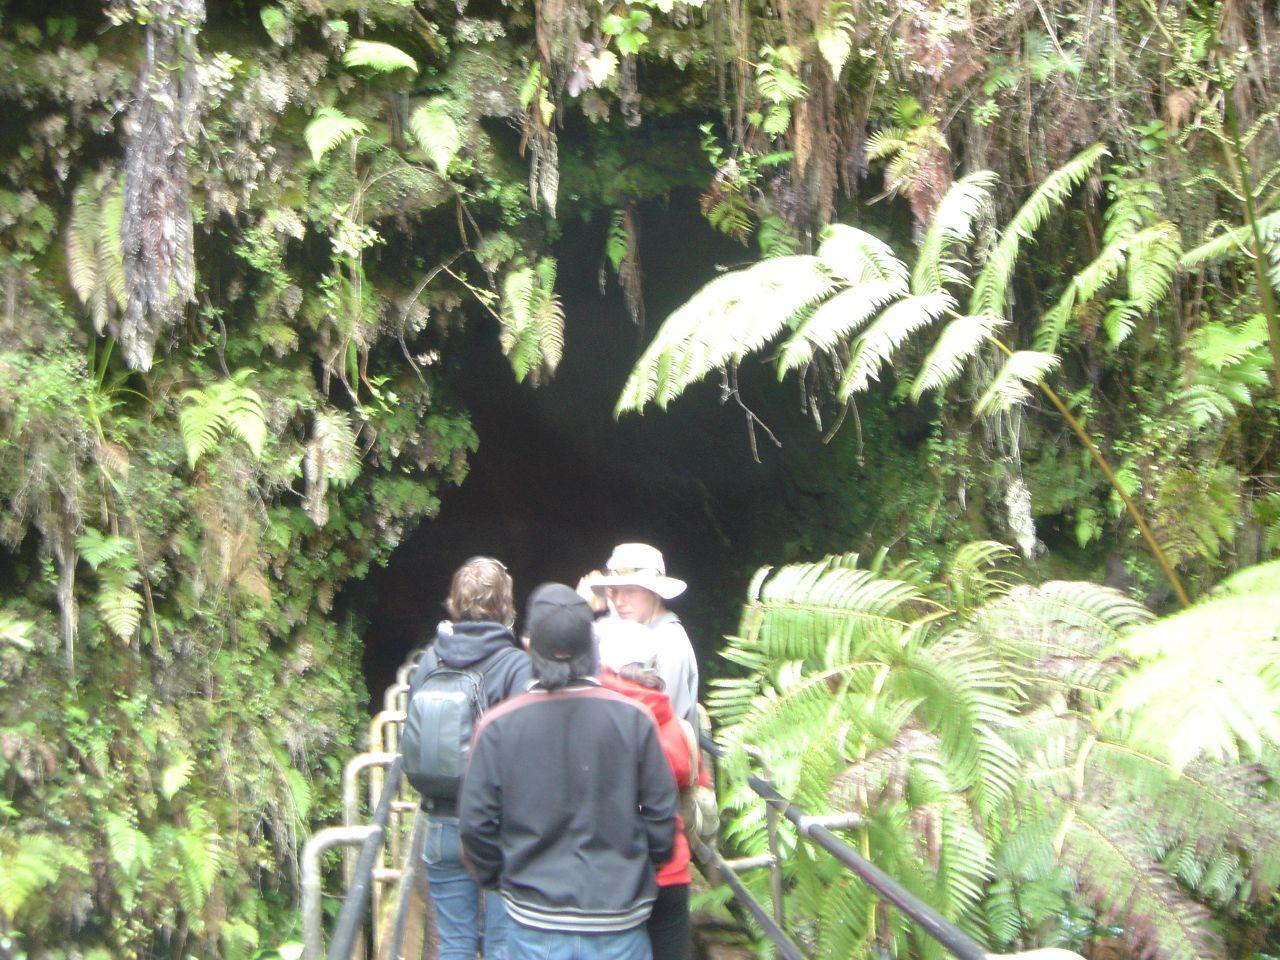 Hiking through rainforest in Hawaii